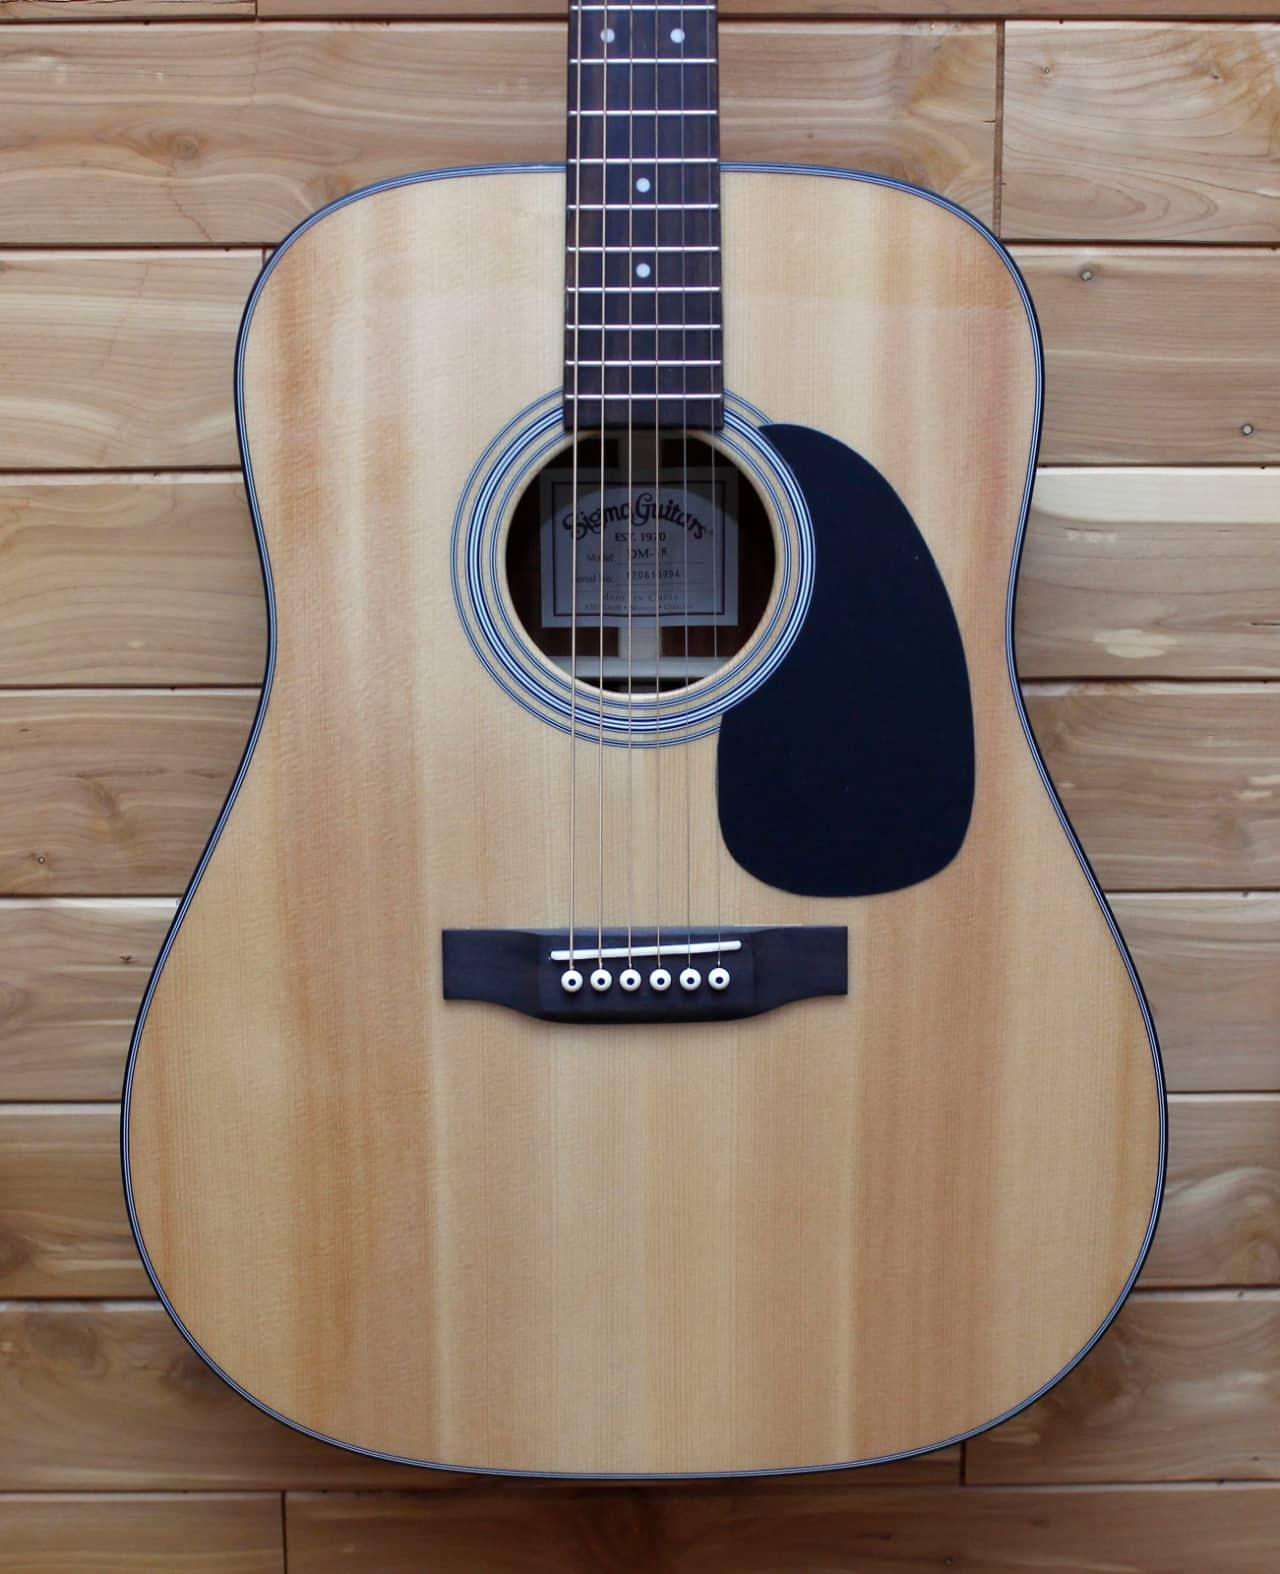 sigma dm 18 dreadnought acoustic guitar sn 120613994 reverb. Black Bedroom Furniture Sets. Home Design Ideas